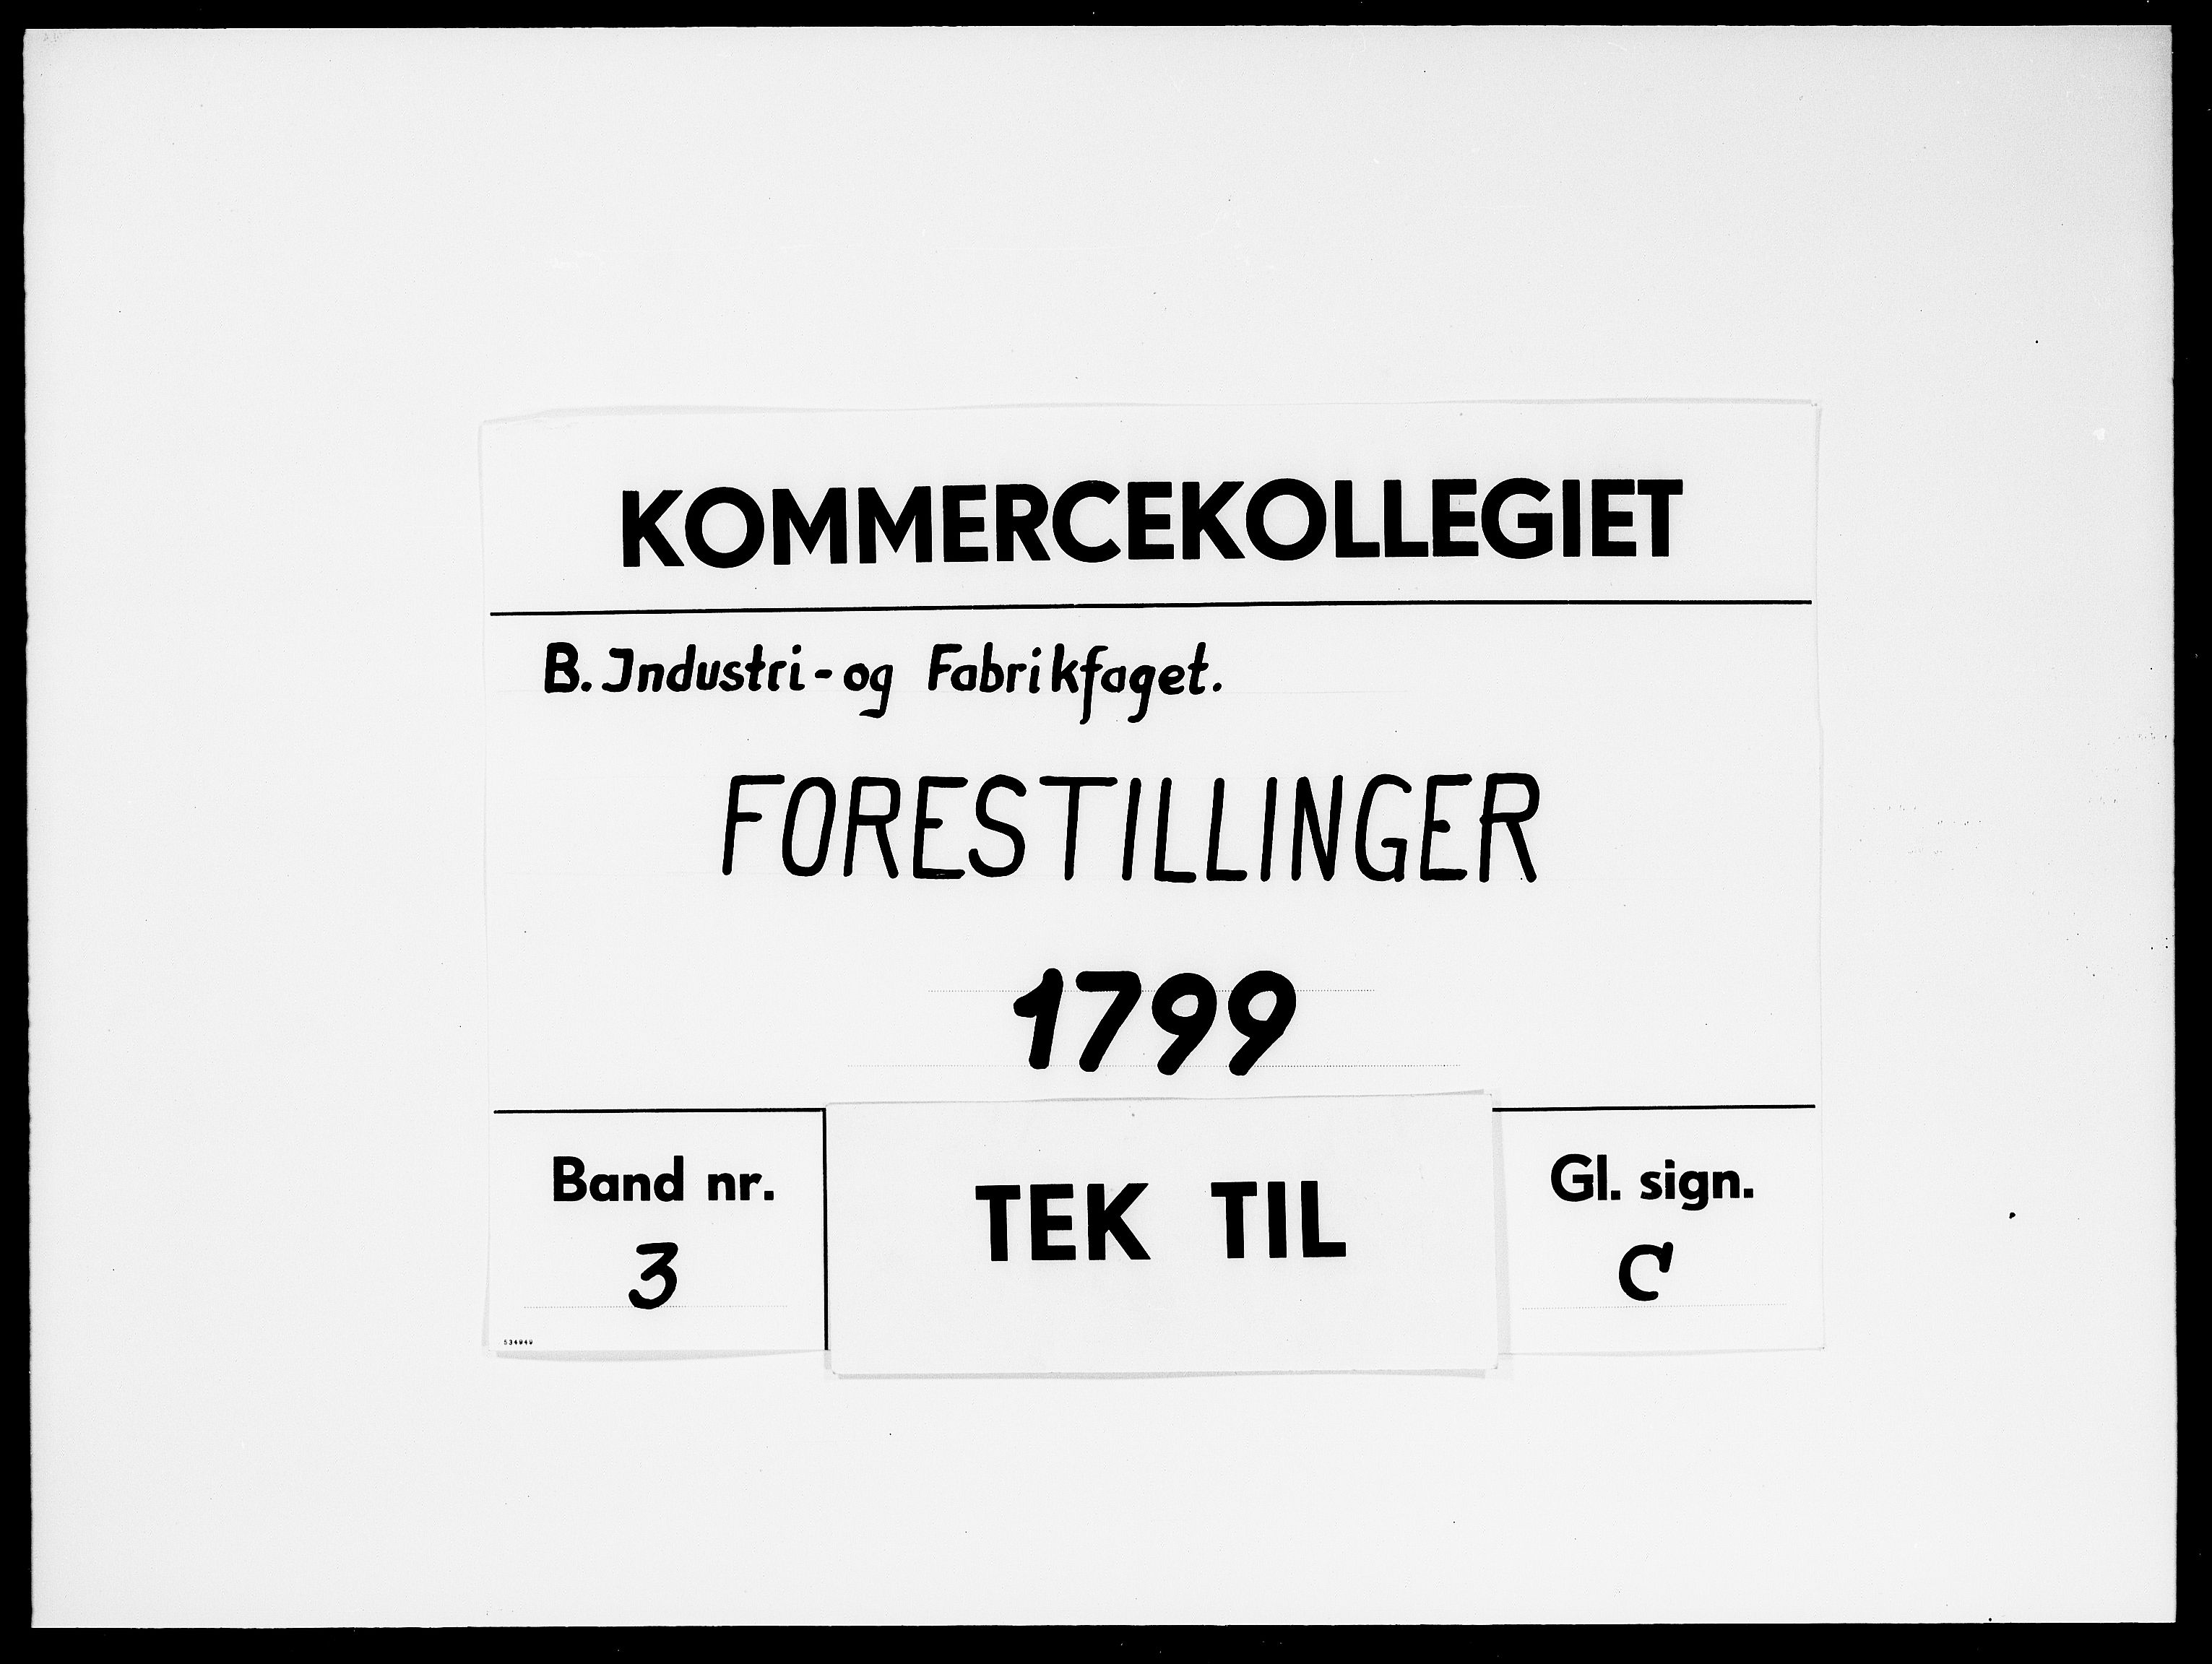 DRA, Kommercekollegiet, Industri- og Fabriksfaget, -/1339: Forestillinger, 1799